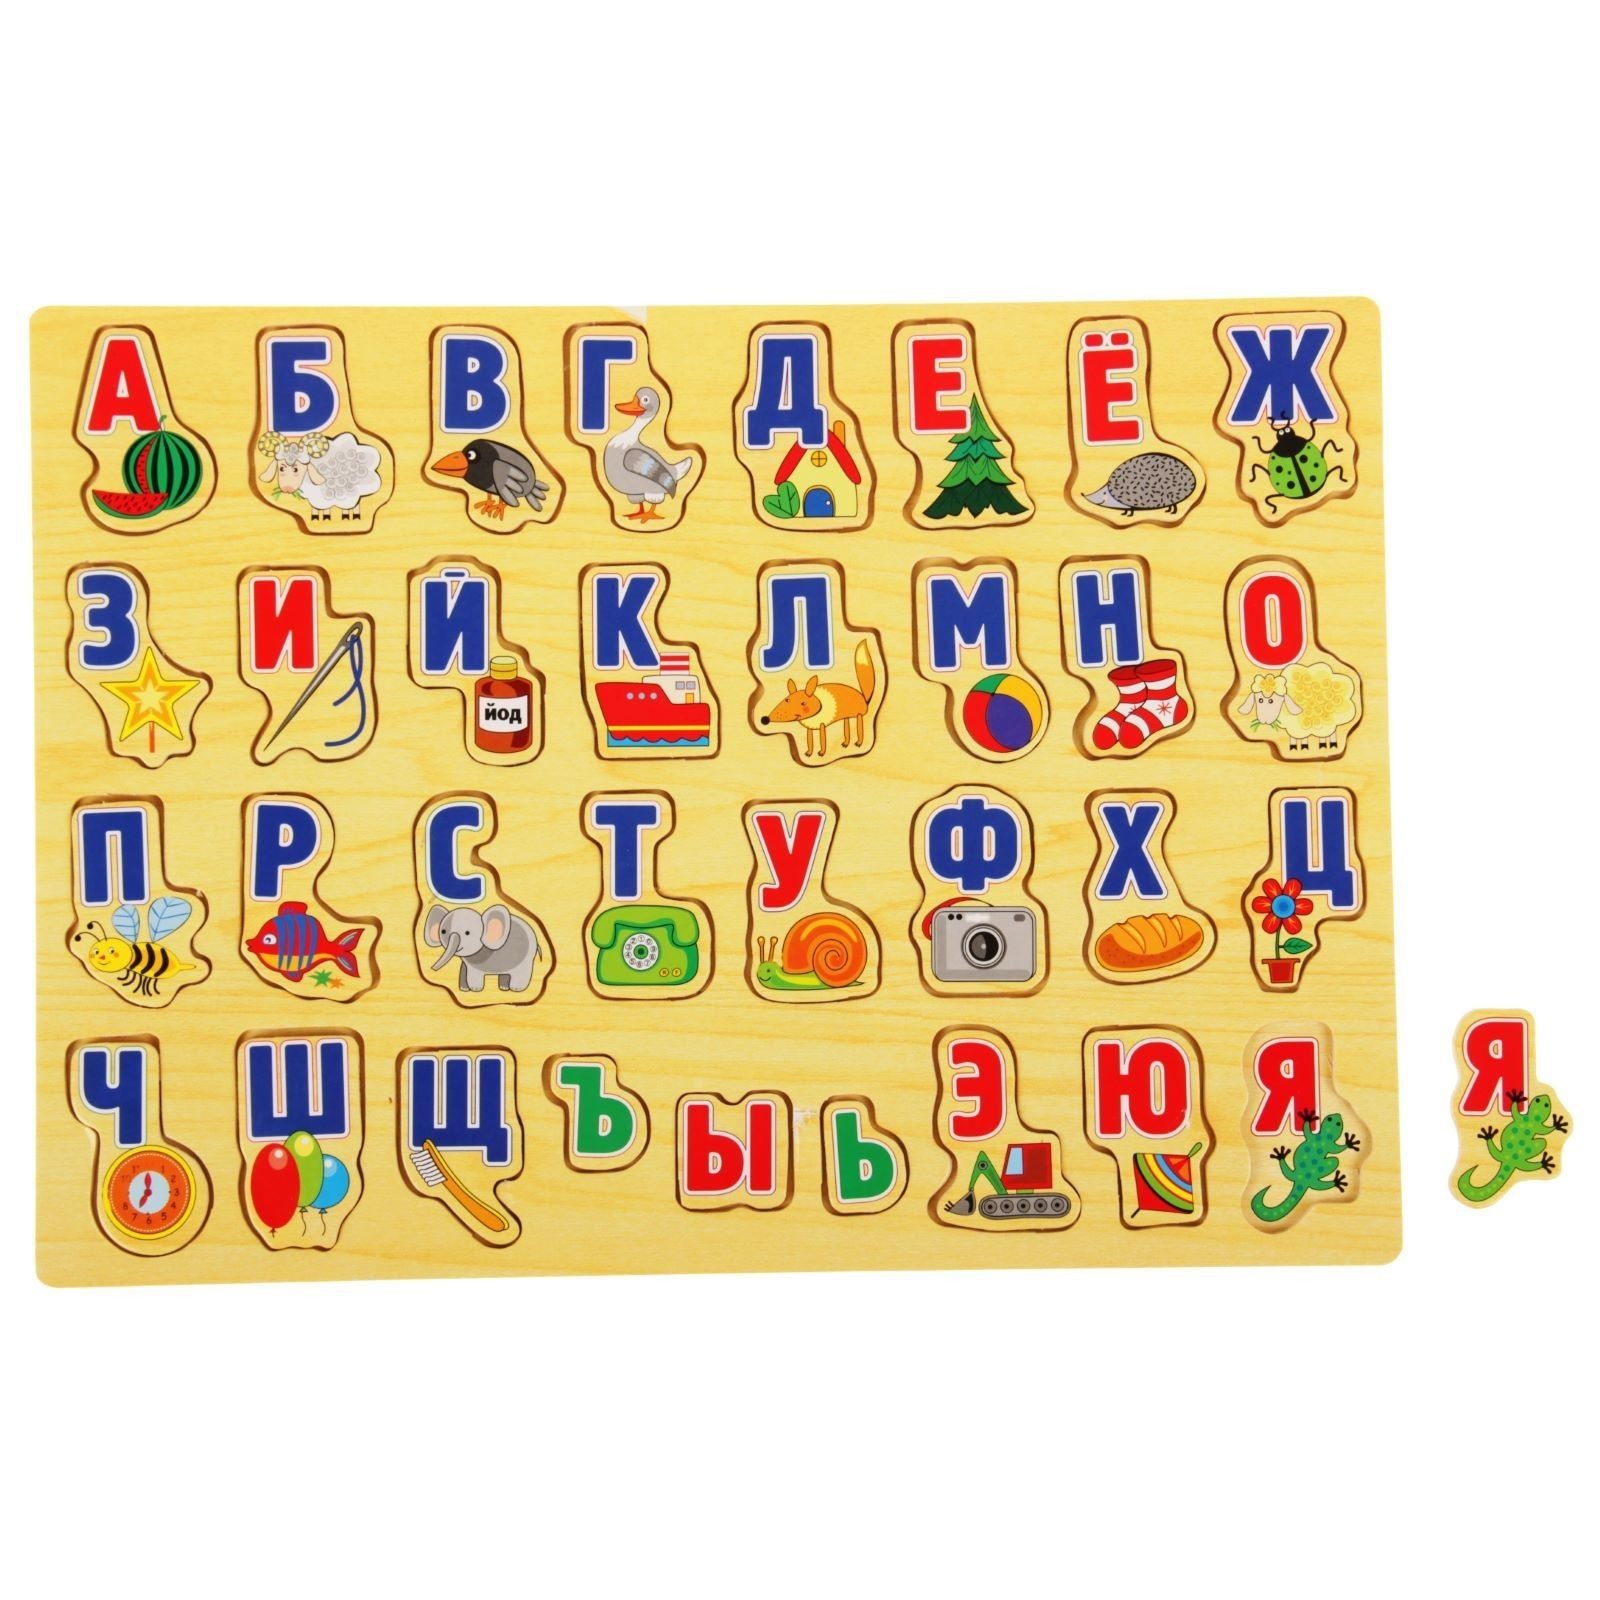 Картинки по запросу алфавит русского языка | Алфавит, Картинки